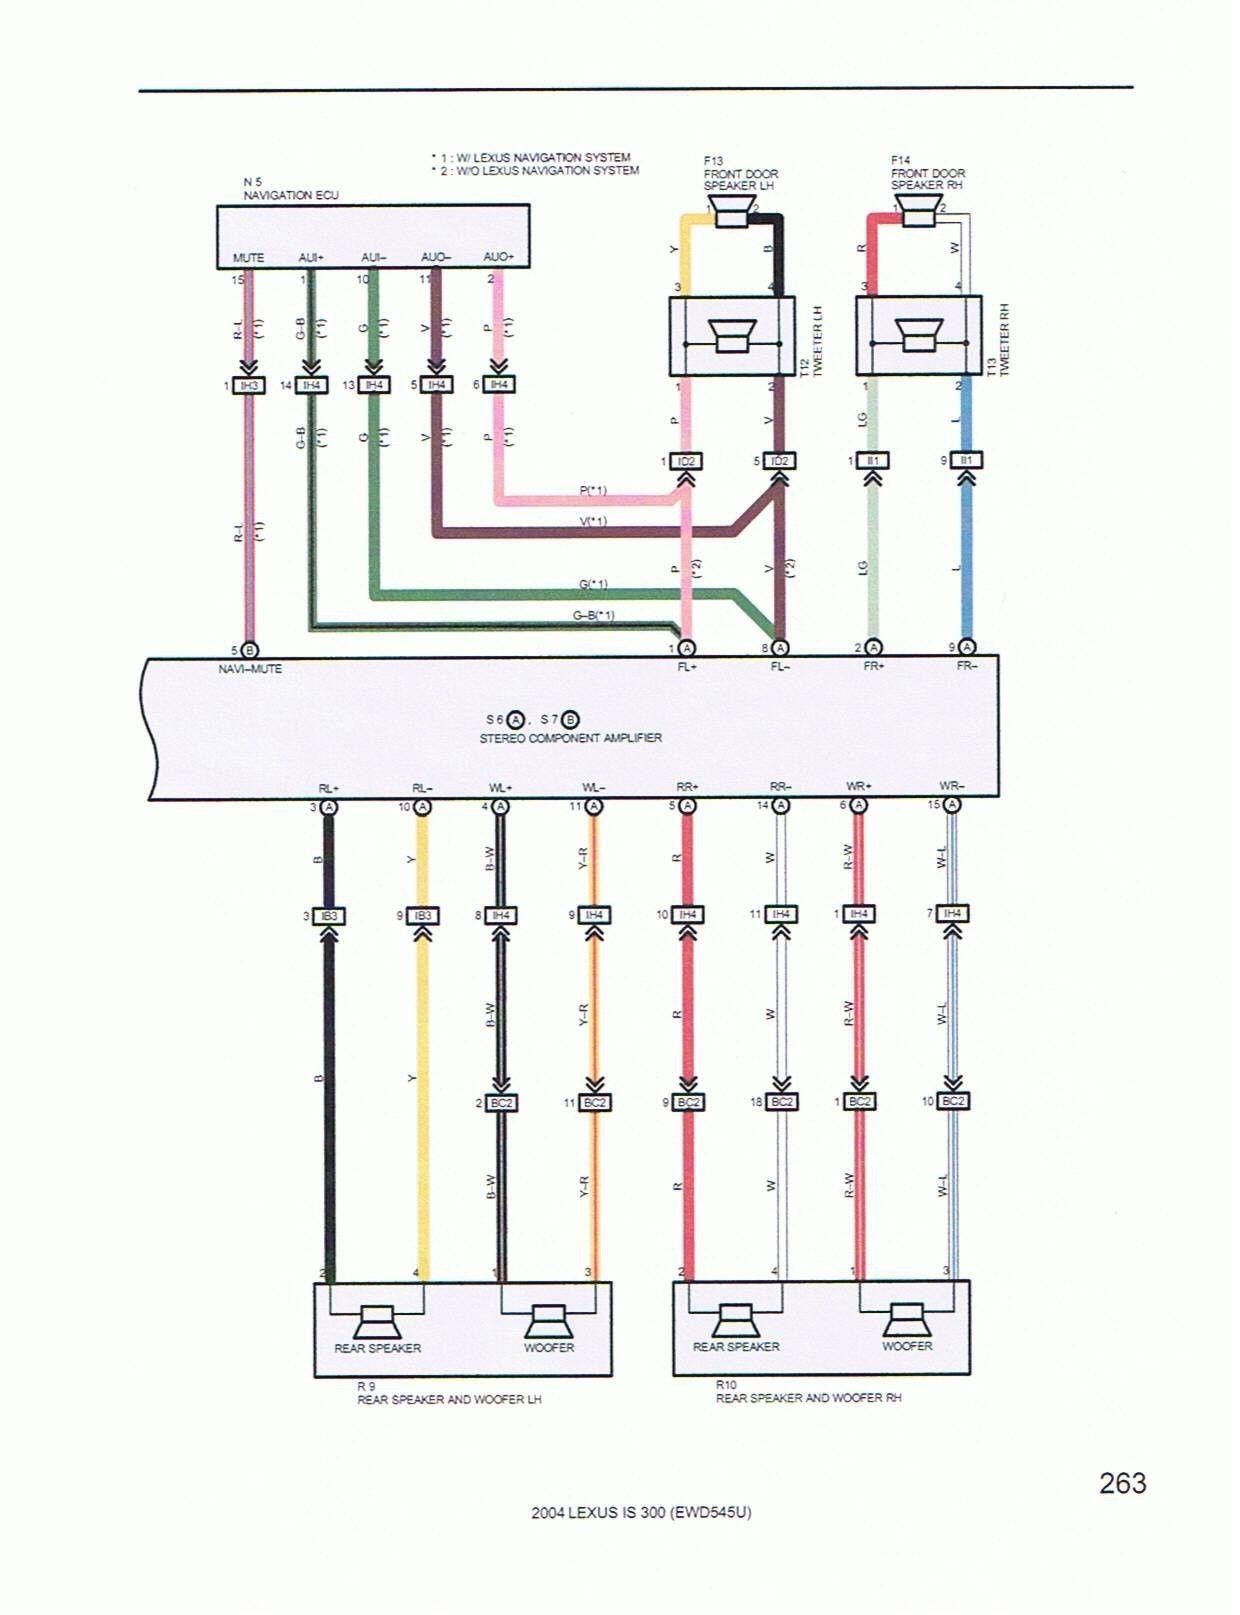 New Golf 4 1 9 Tdi Wiring Diagram Diagram Diagramsample Diagramtemplate Wiringdiagram Diagramchart Wo Vw Jetta Volkswagen Jetta Electrical Wiring Diagram